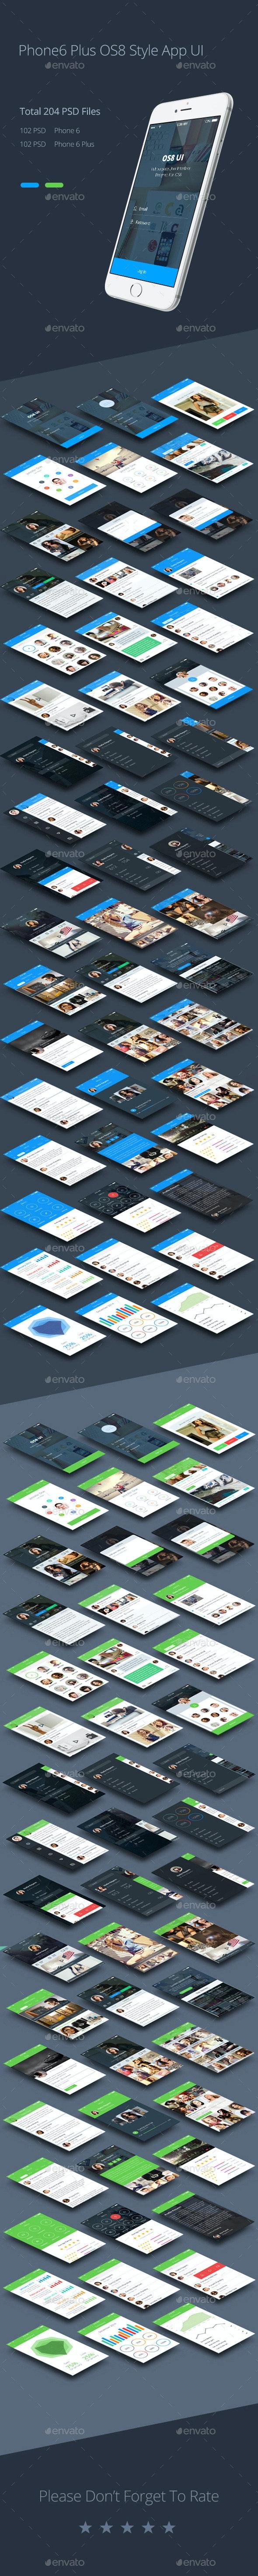 Phone 6 Plus OS 8 Style App UI Templates - User Interfaces Web Elements